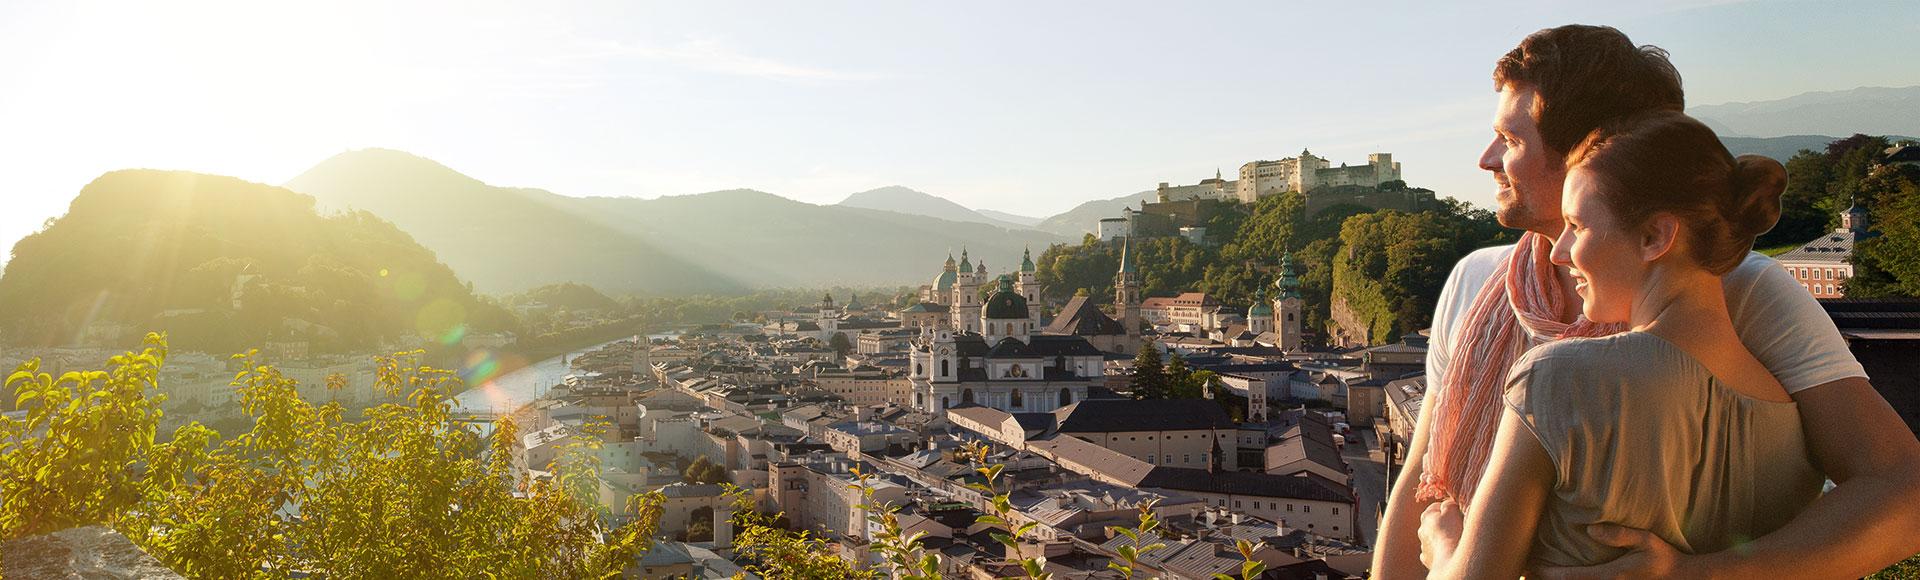 Ausflugsziel Stadt Salzburg Salzburger Land 1